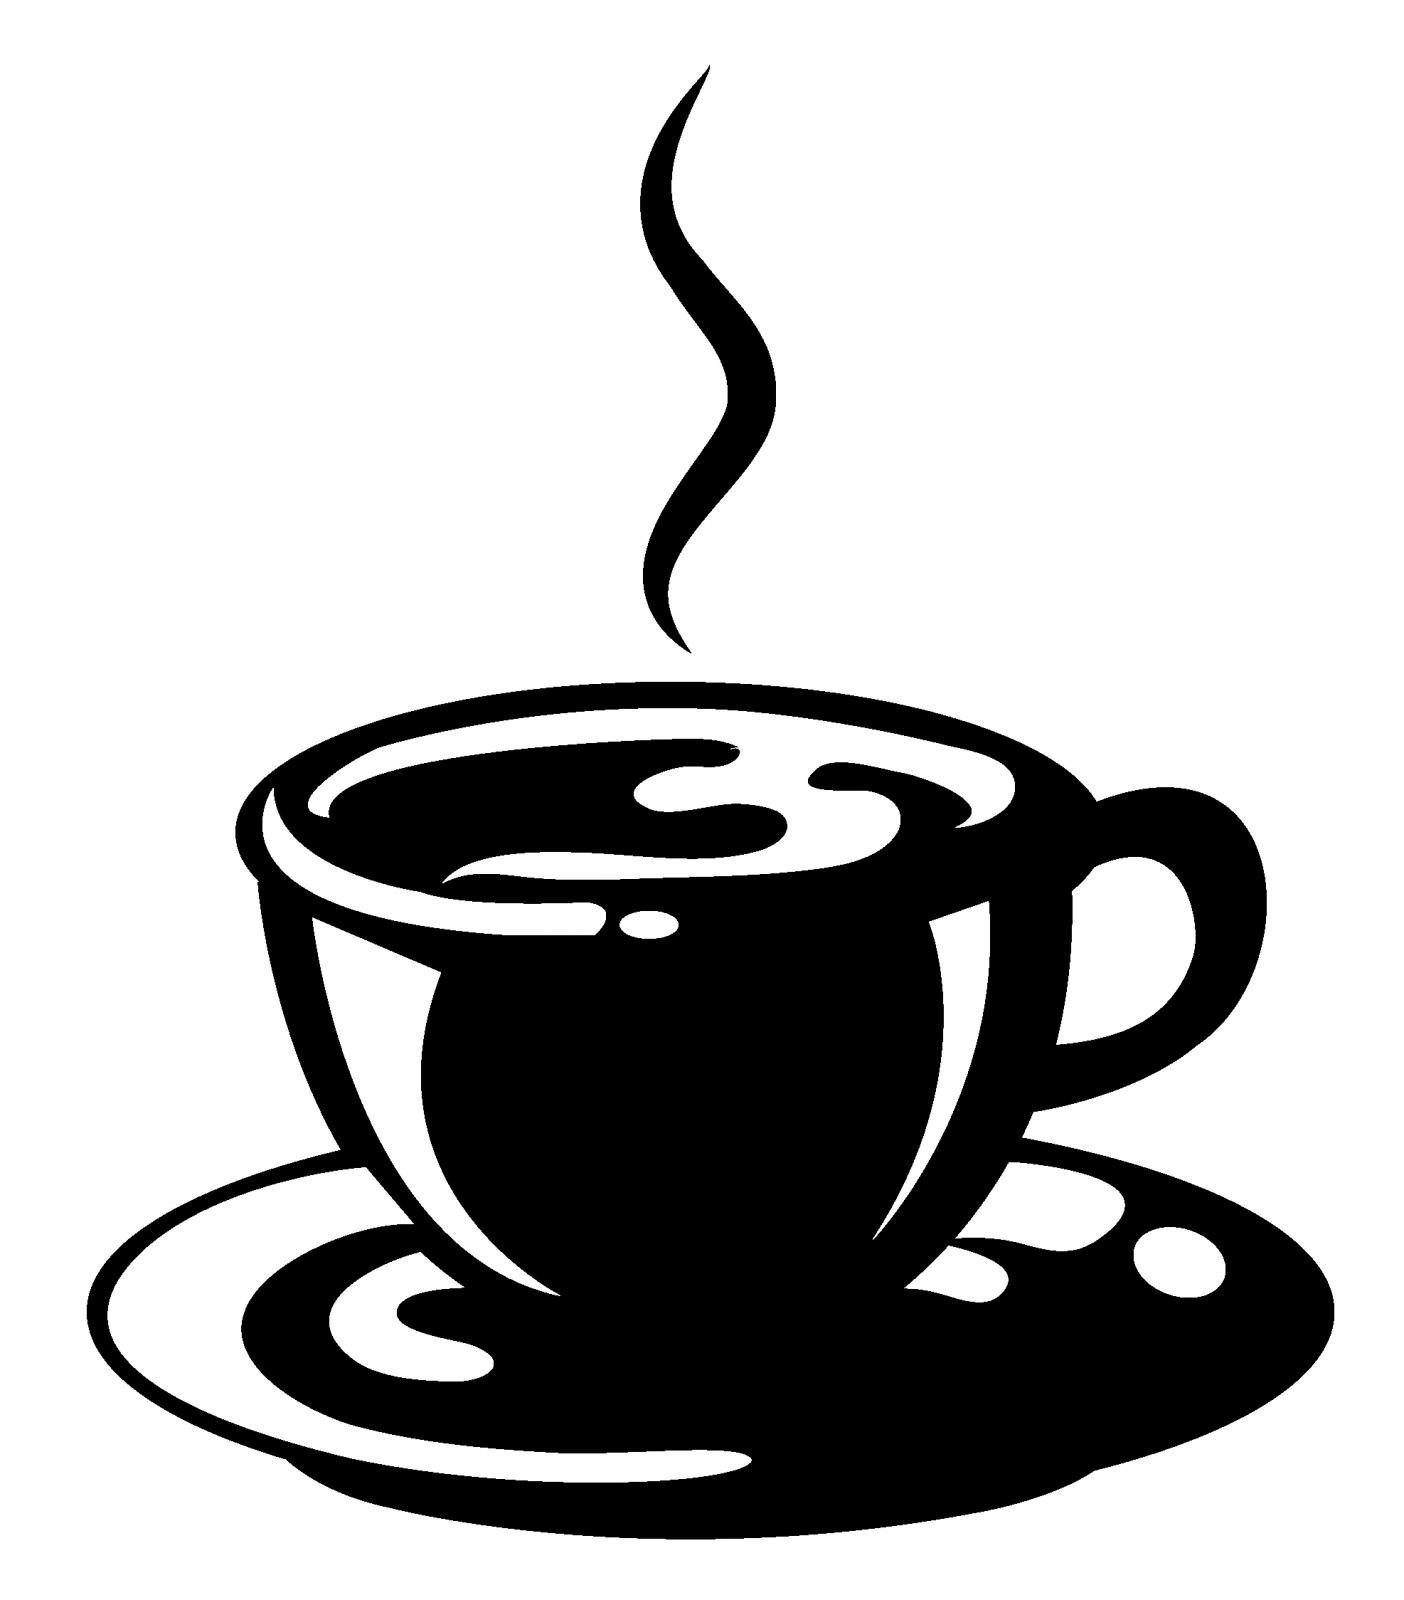 coffee can clip art - photo #15